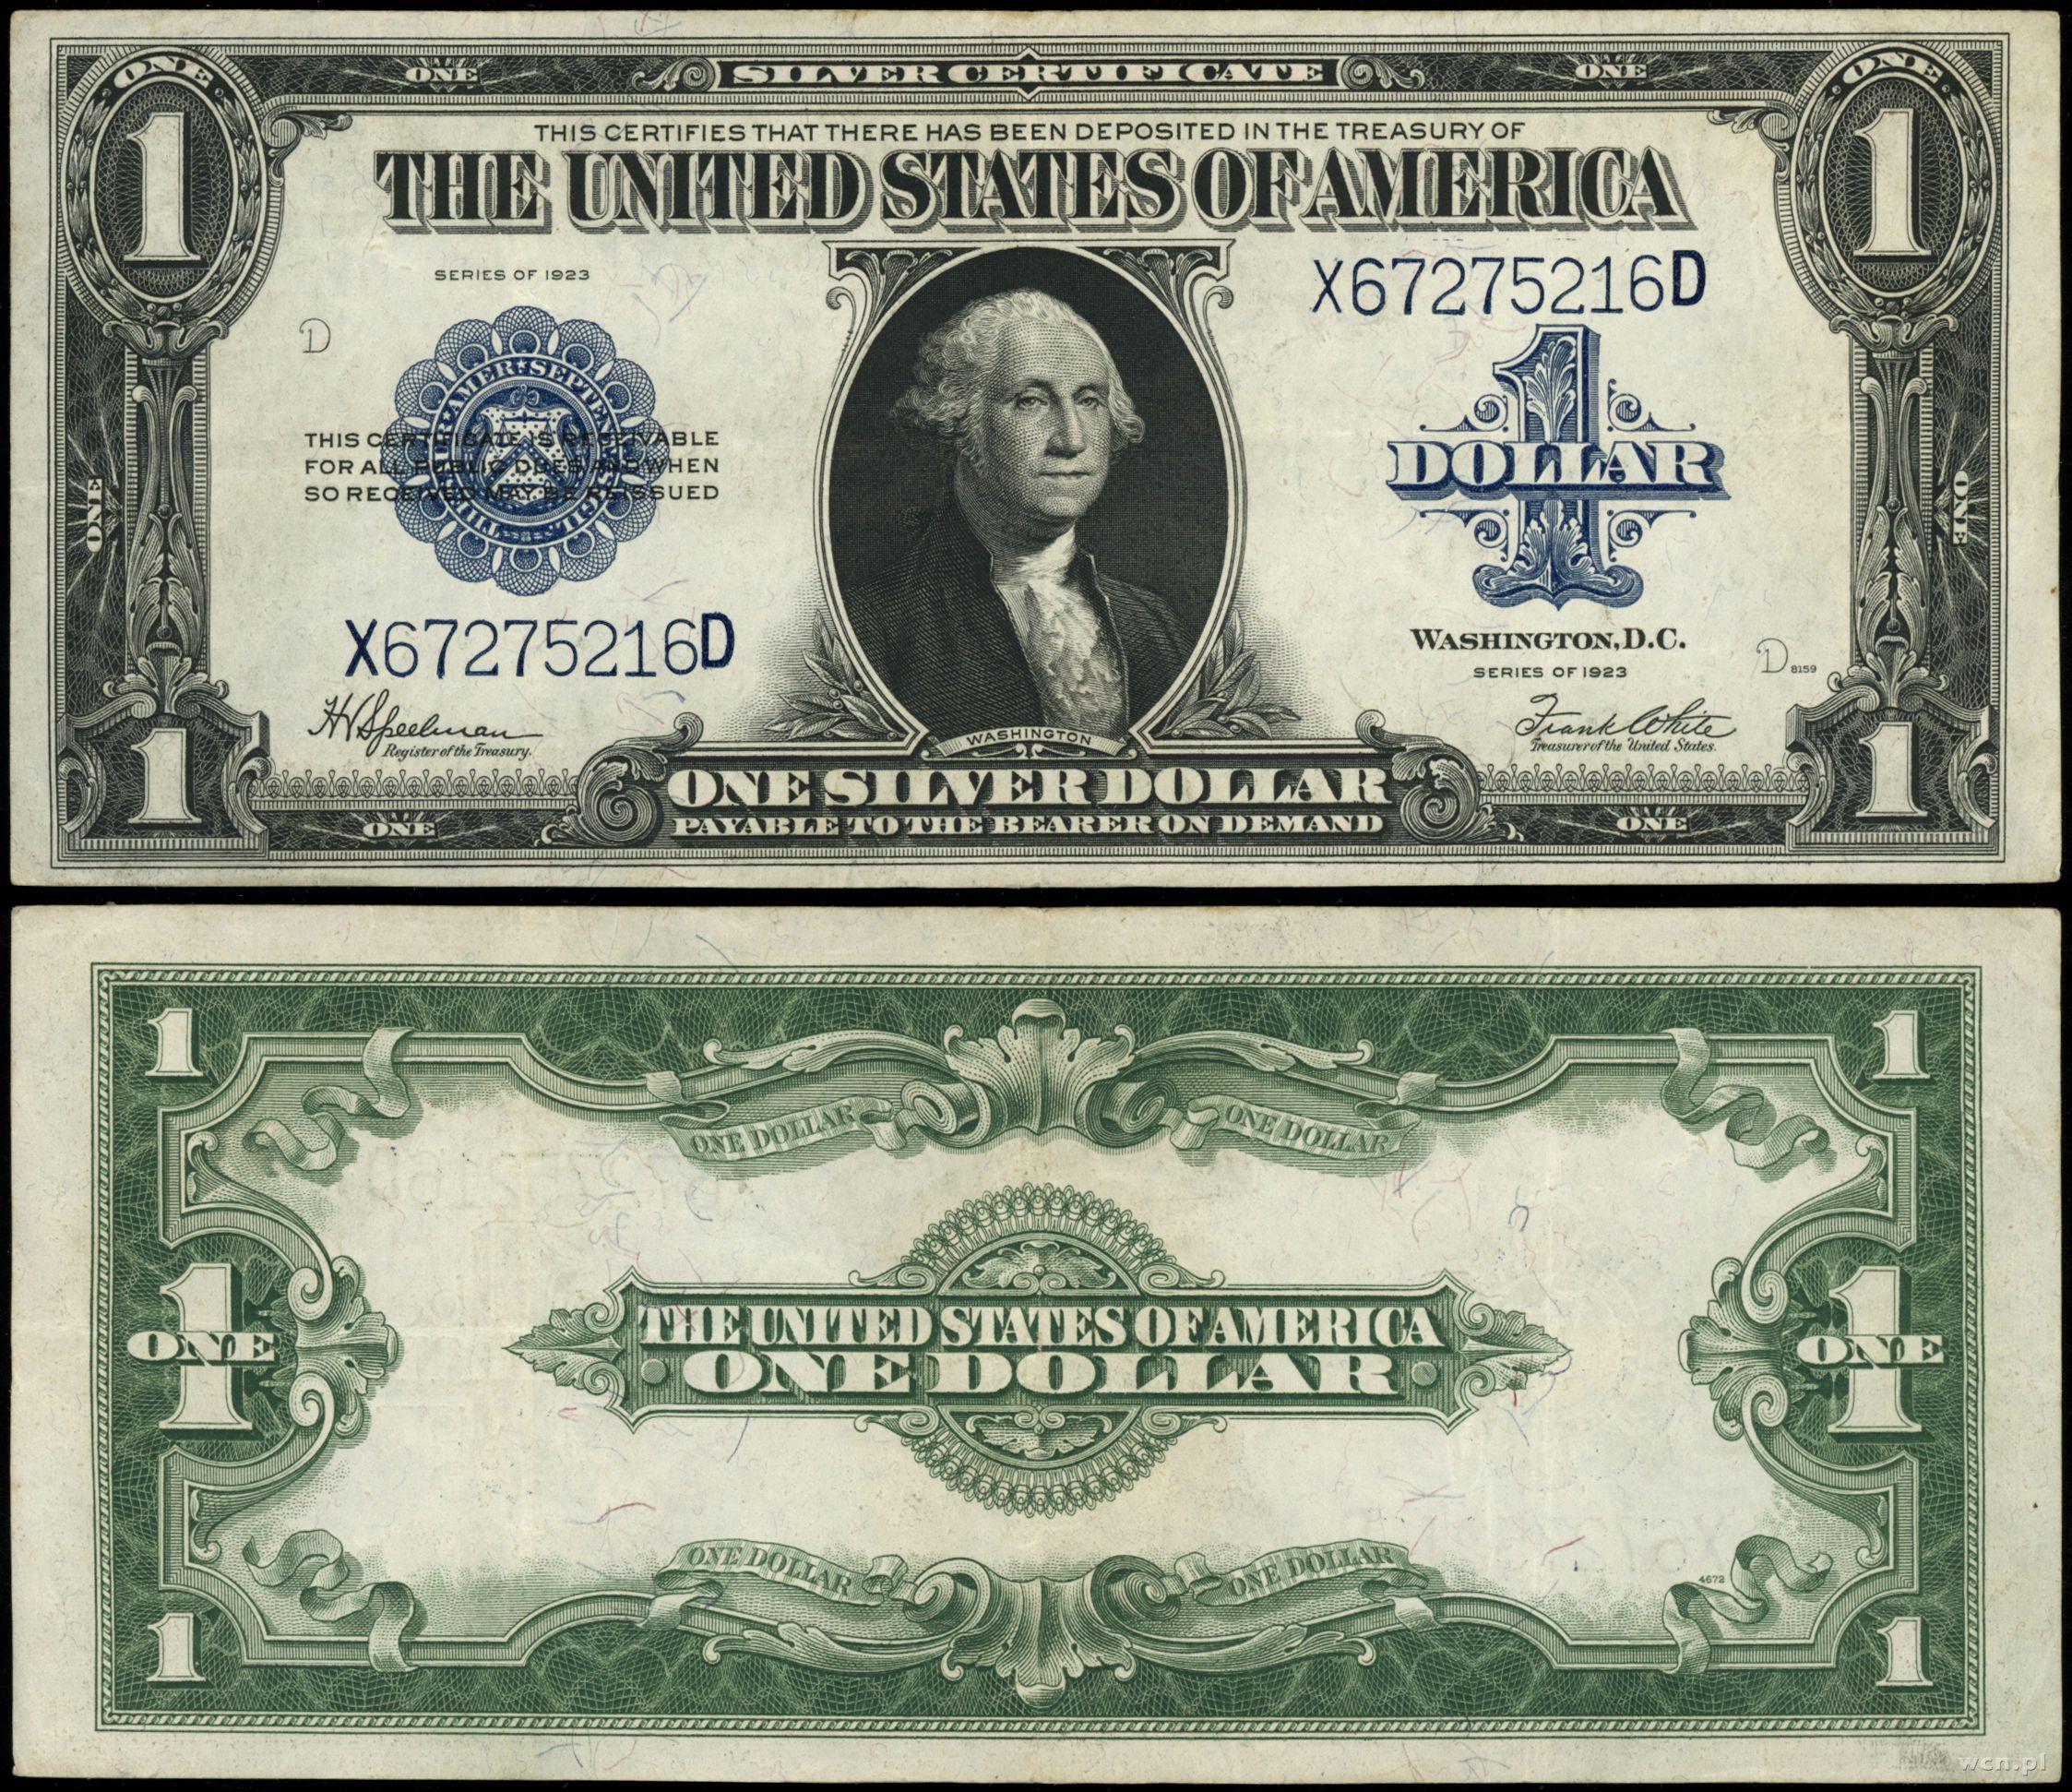 السعر 200 100 Dolar: 1 Dolar, 1923, Stany Zjednoczone Ameryki (USA)